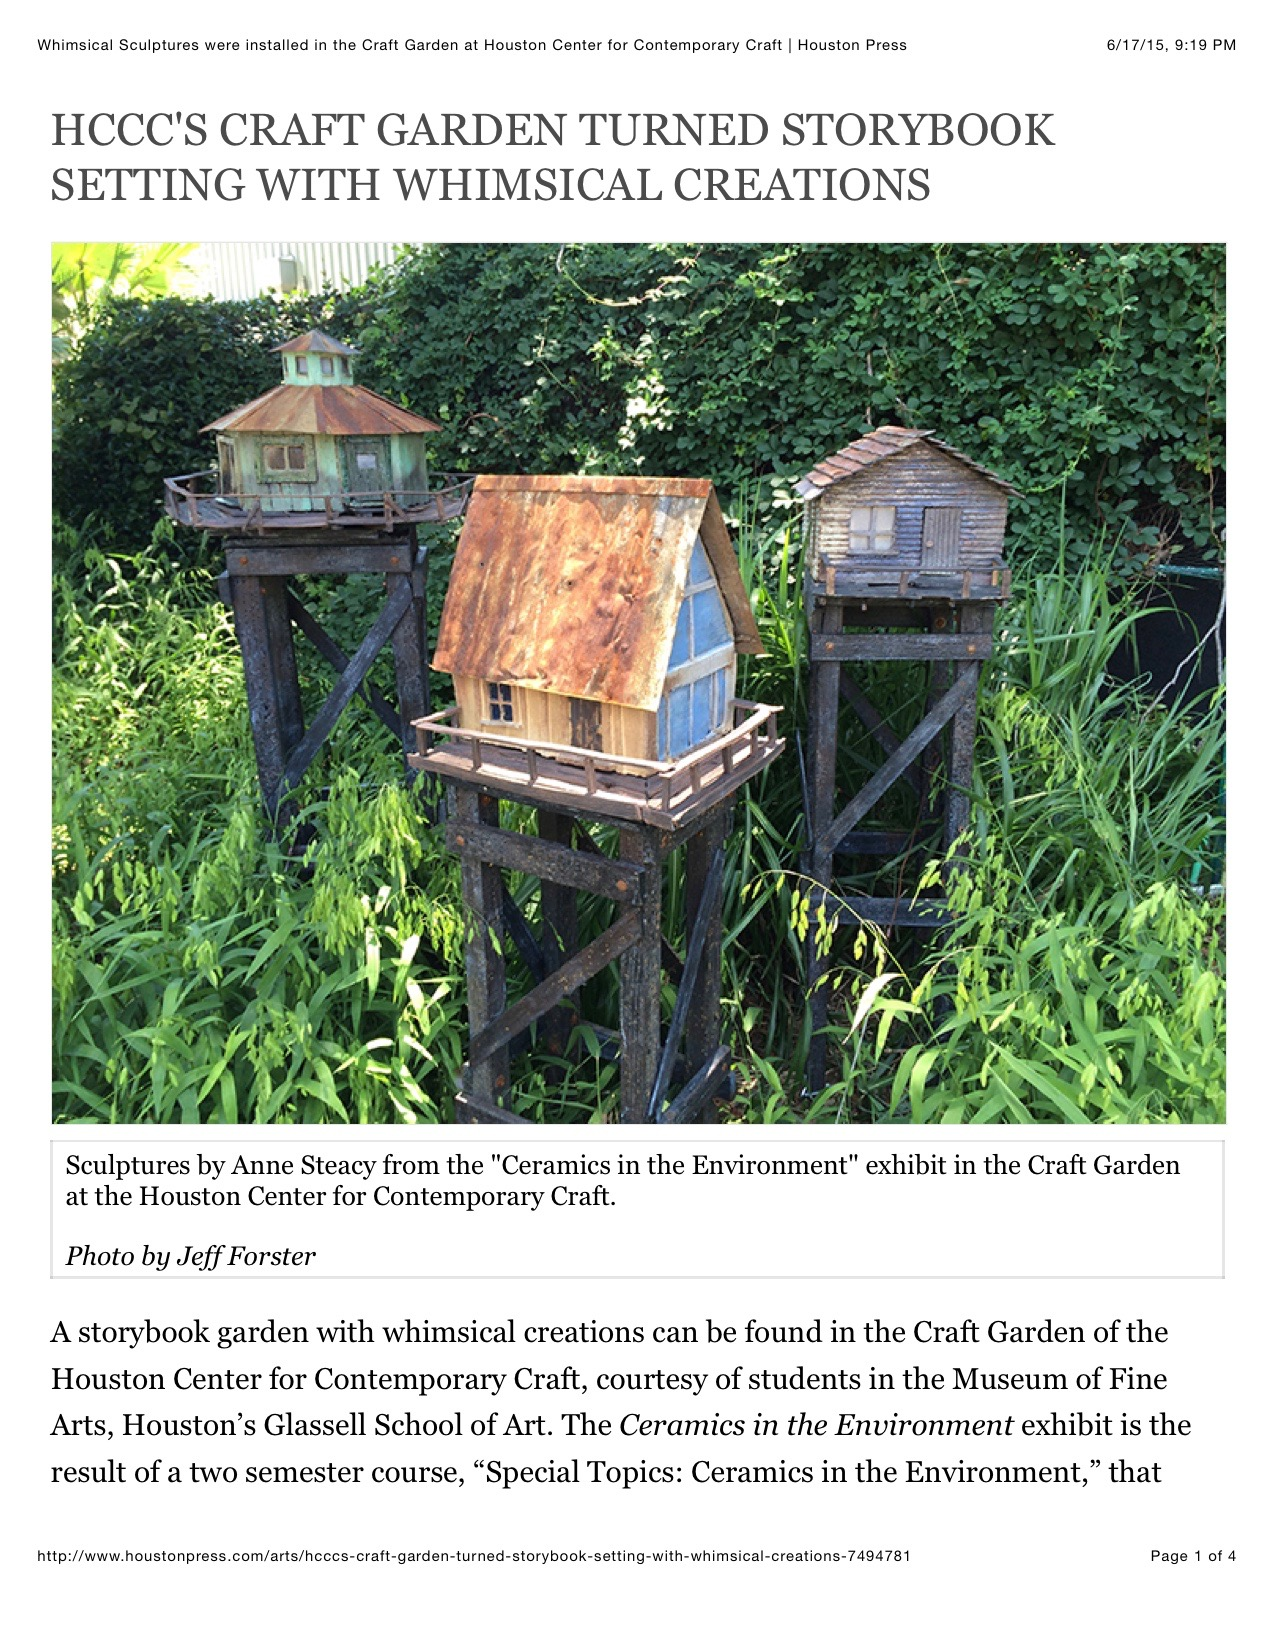 HCCC Garden Article.jpg